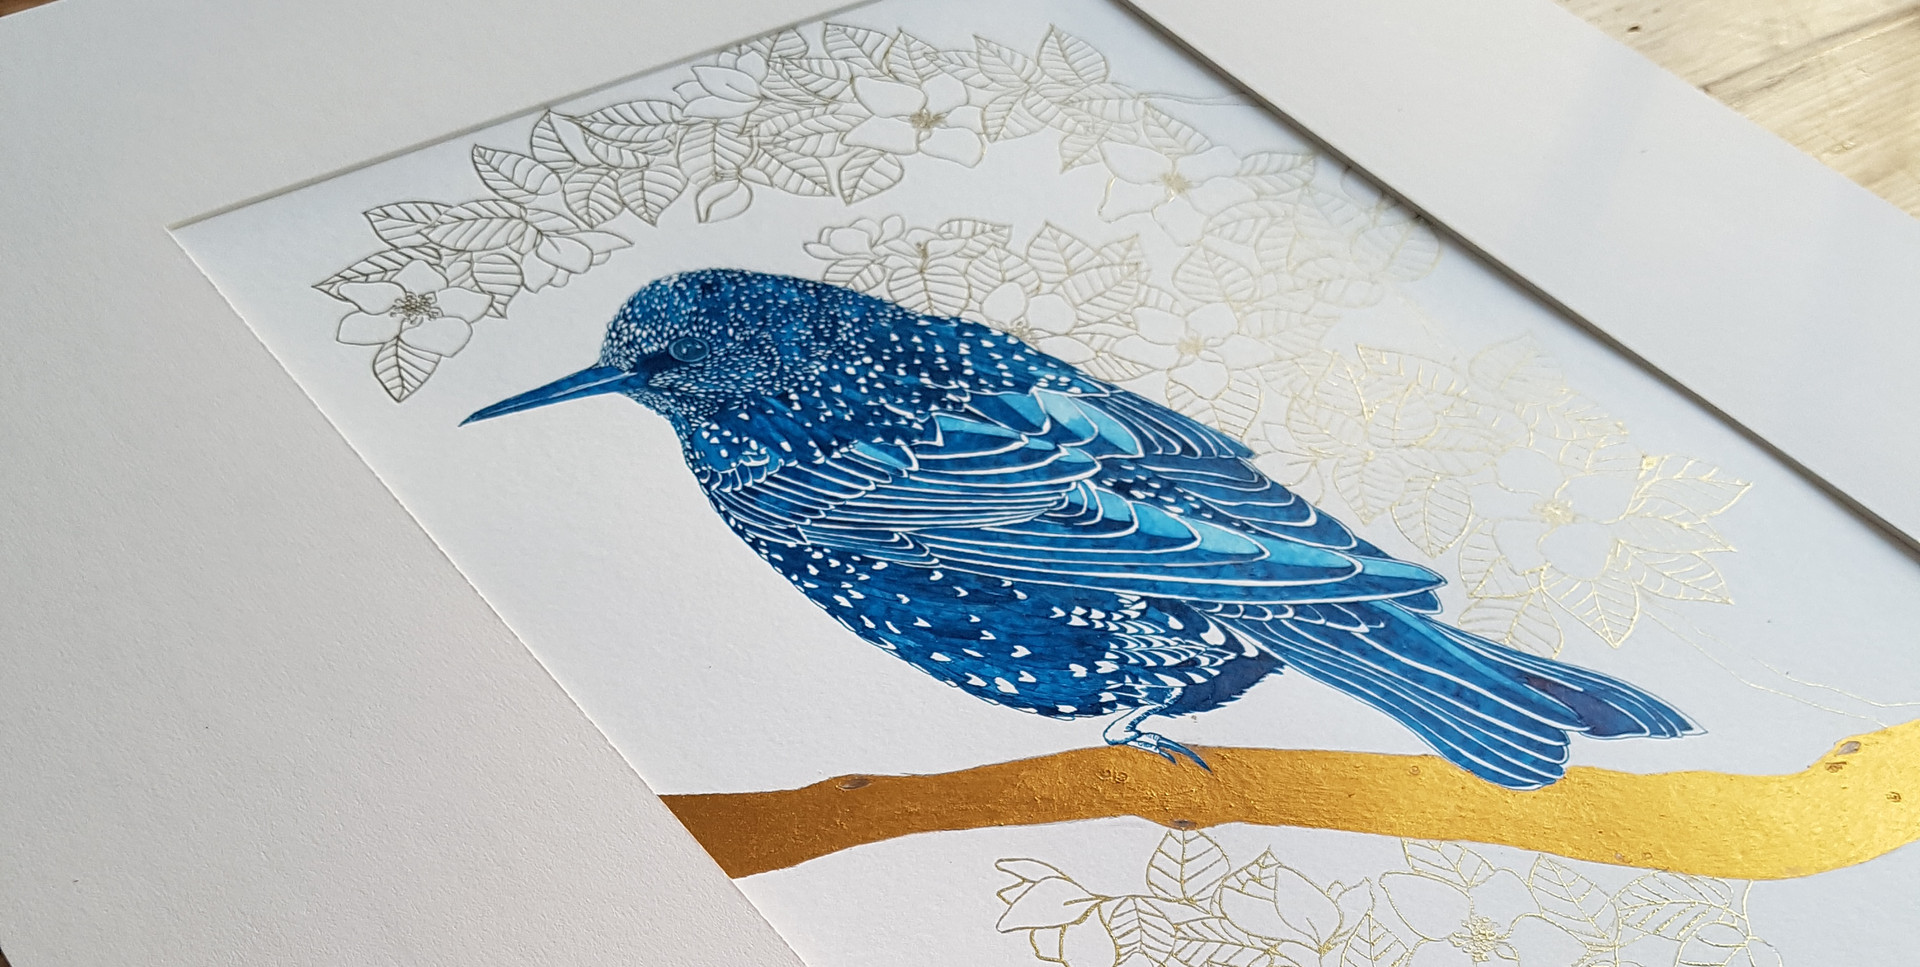 Starling Artwork by Howell Illustration